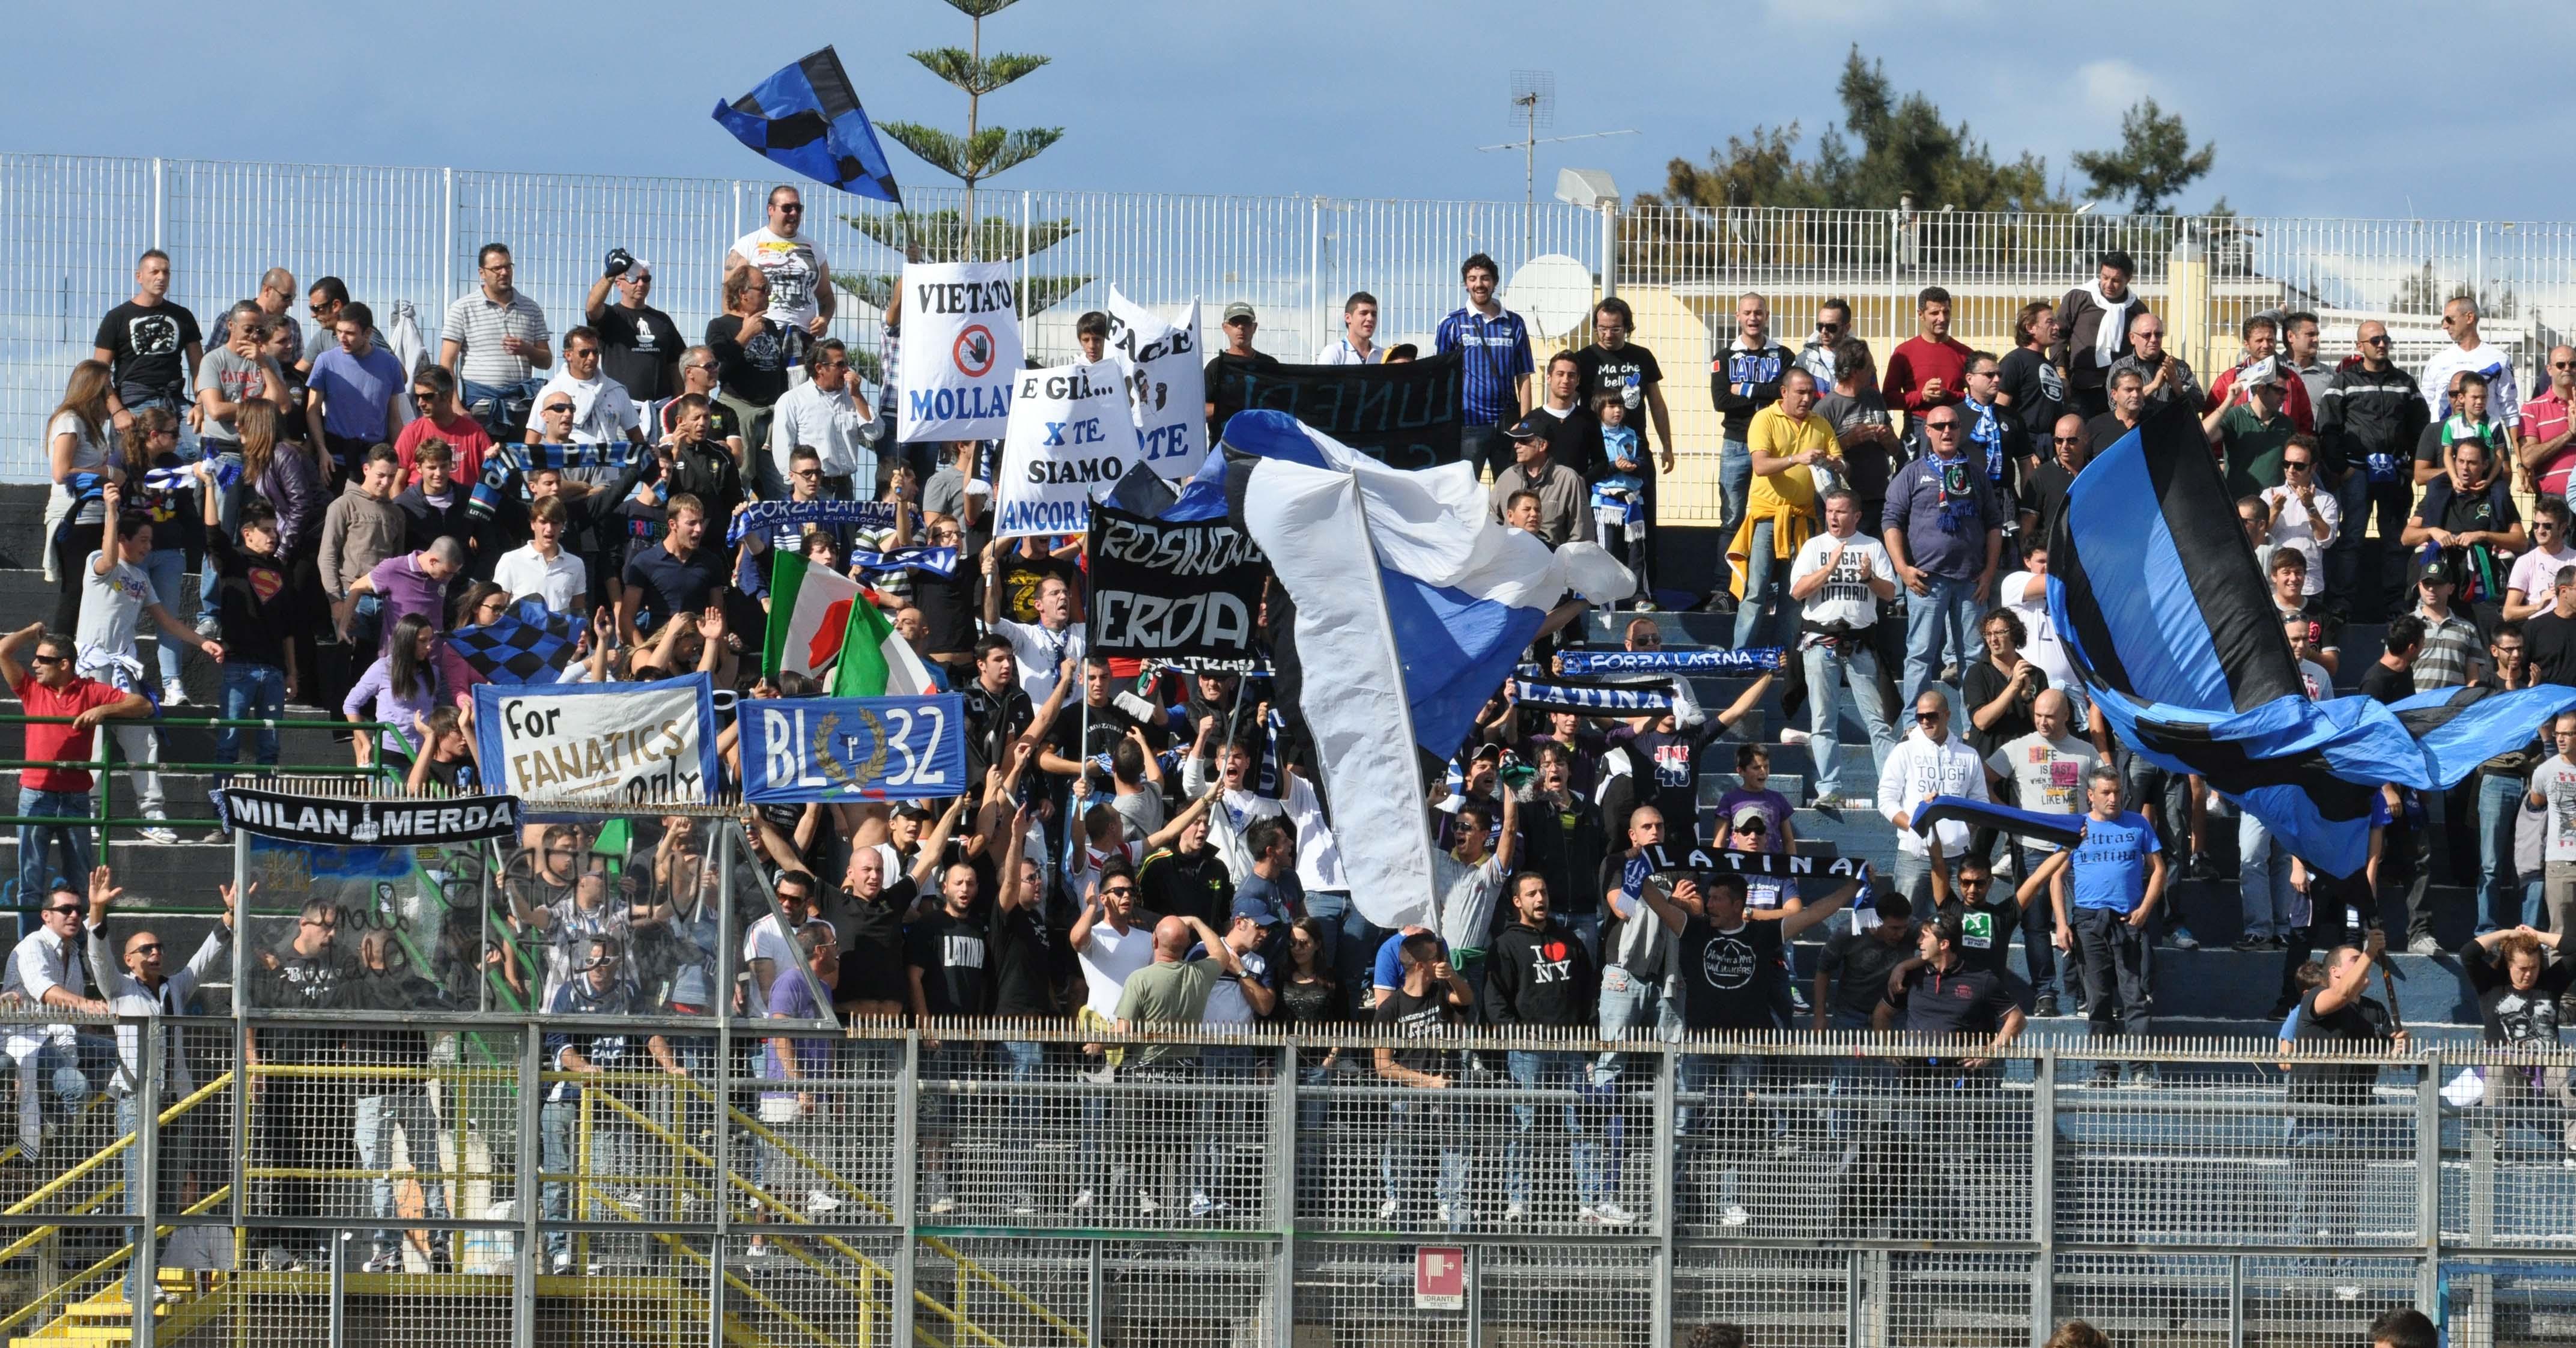 latina-calcio-tifosi-stadio-8347622356